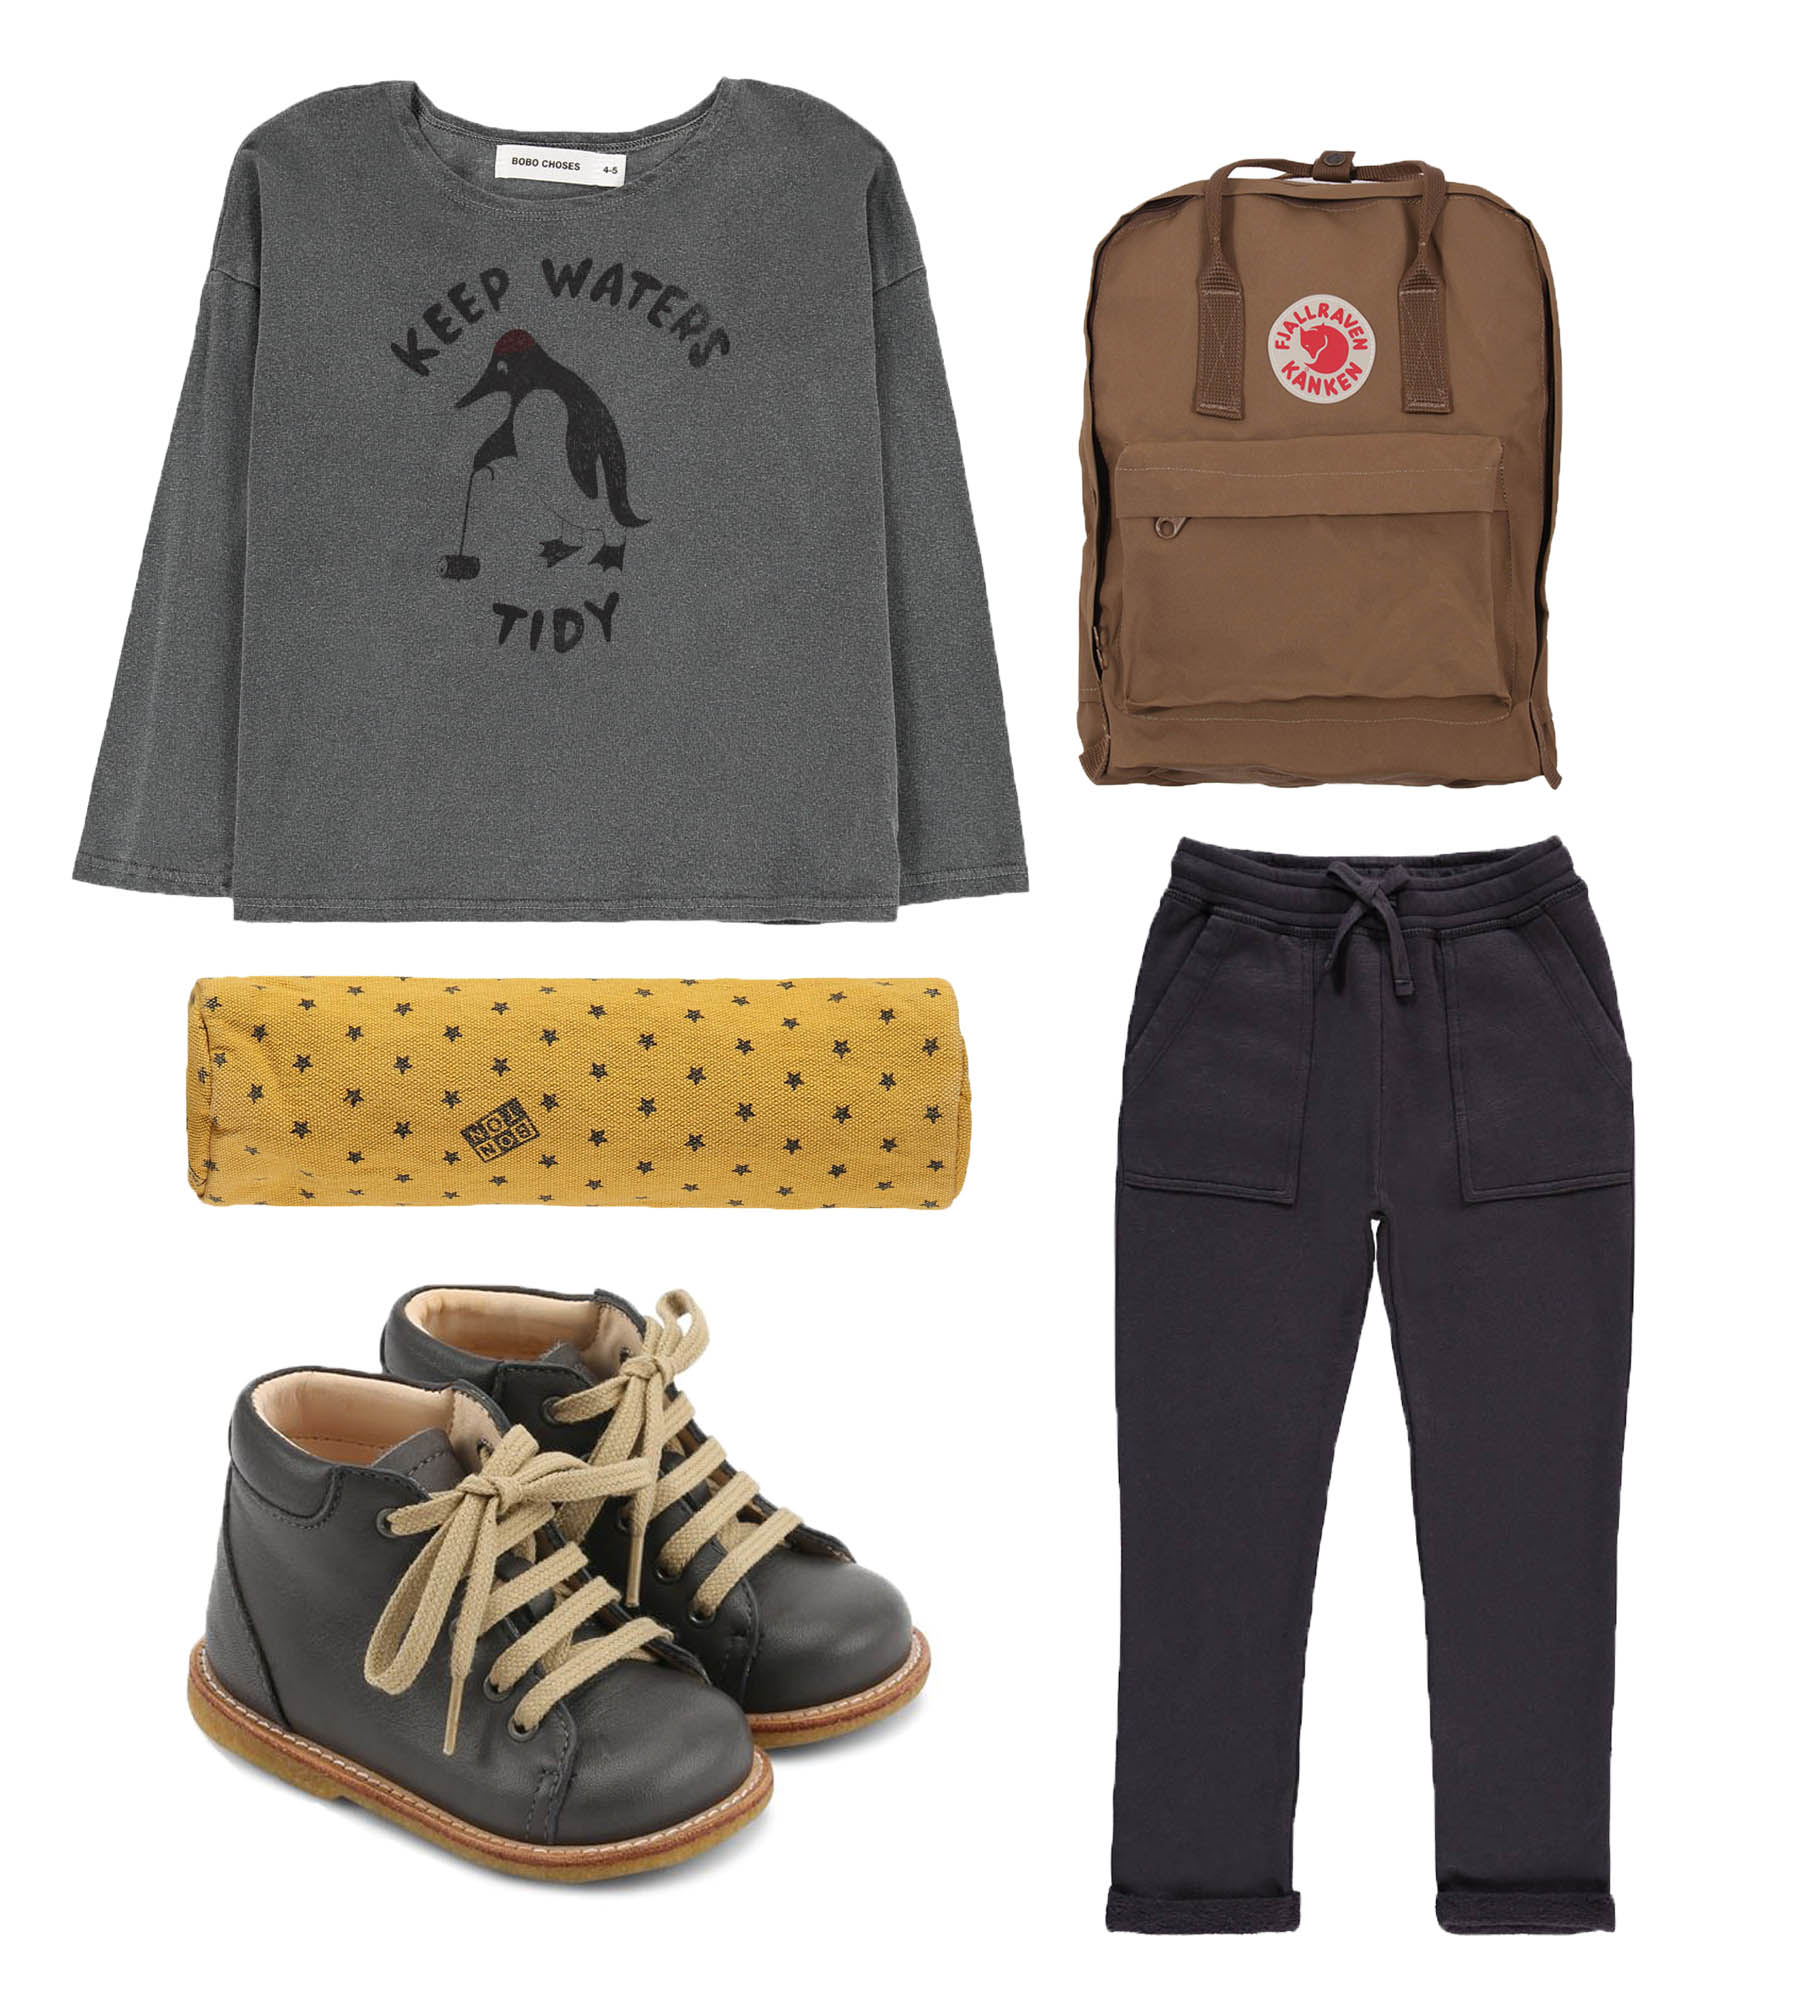 Blouse/ BOBO CHOSES  Pencil case/ BONTON  Shoes/ ANGULUS  Bag/ FJALLRAVEN  Pants/ BONTON